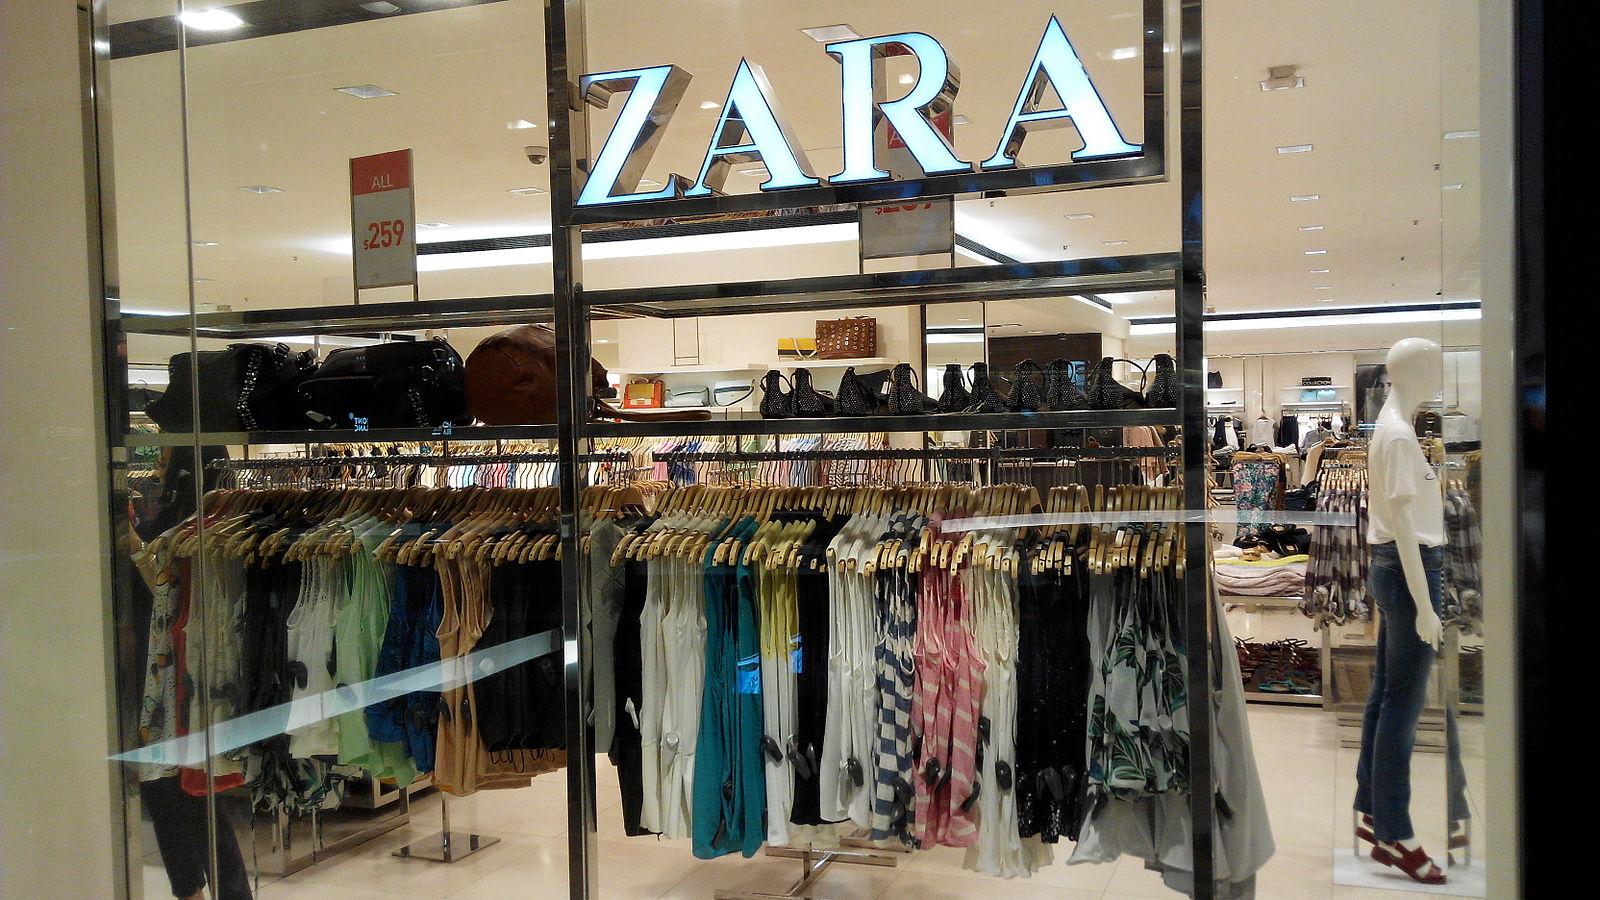 hk_cwb_time_square_mall_shop_zara_clothing_july-2014_redmi.jpg